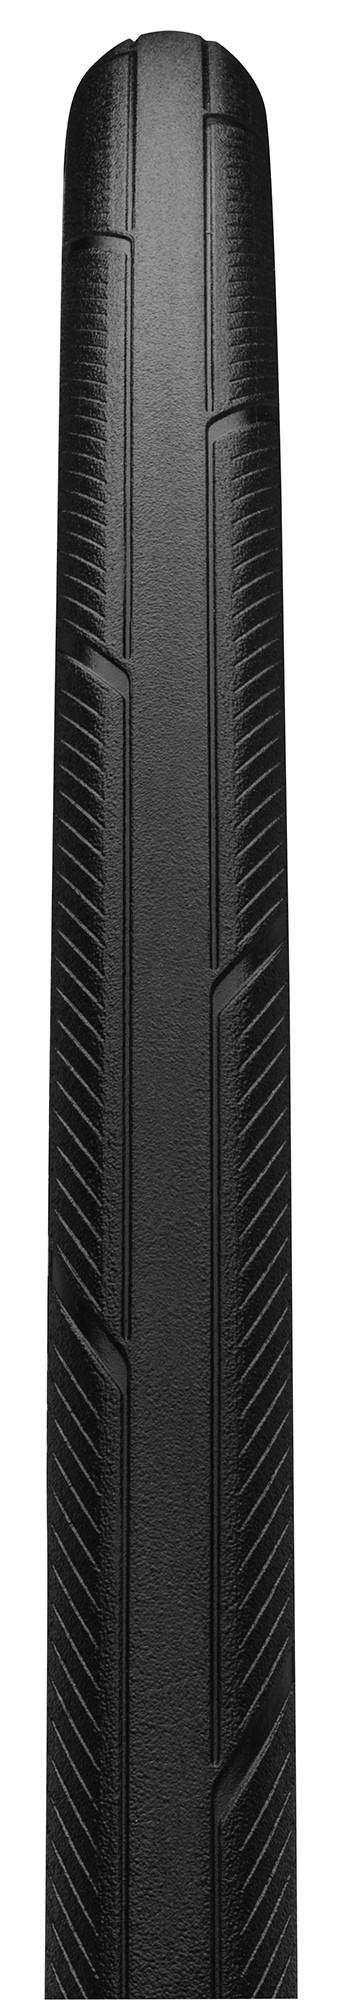 Anvelopa pliabila Continental UltraSport III 23-622 negru/albastru - Wheelsports